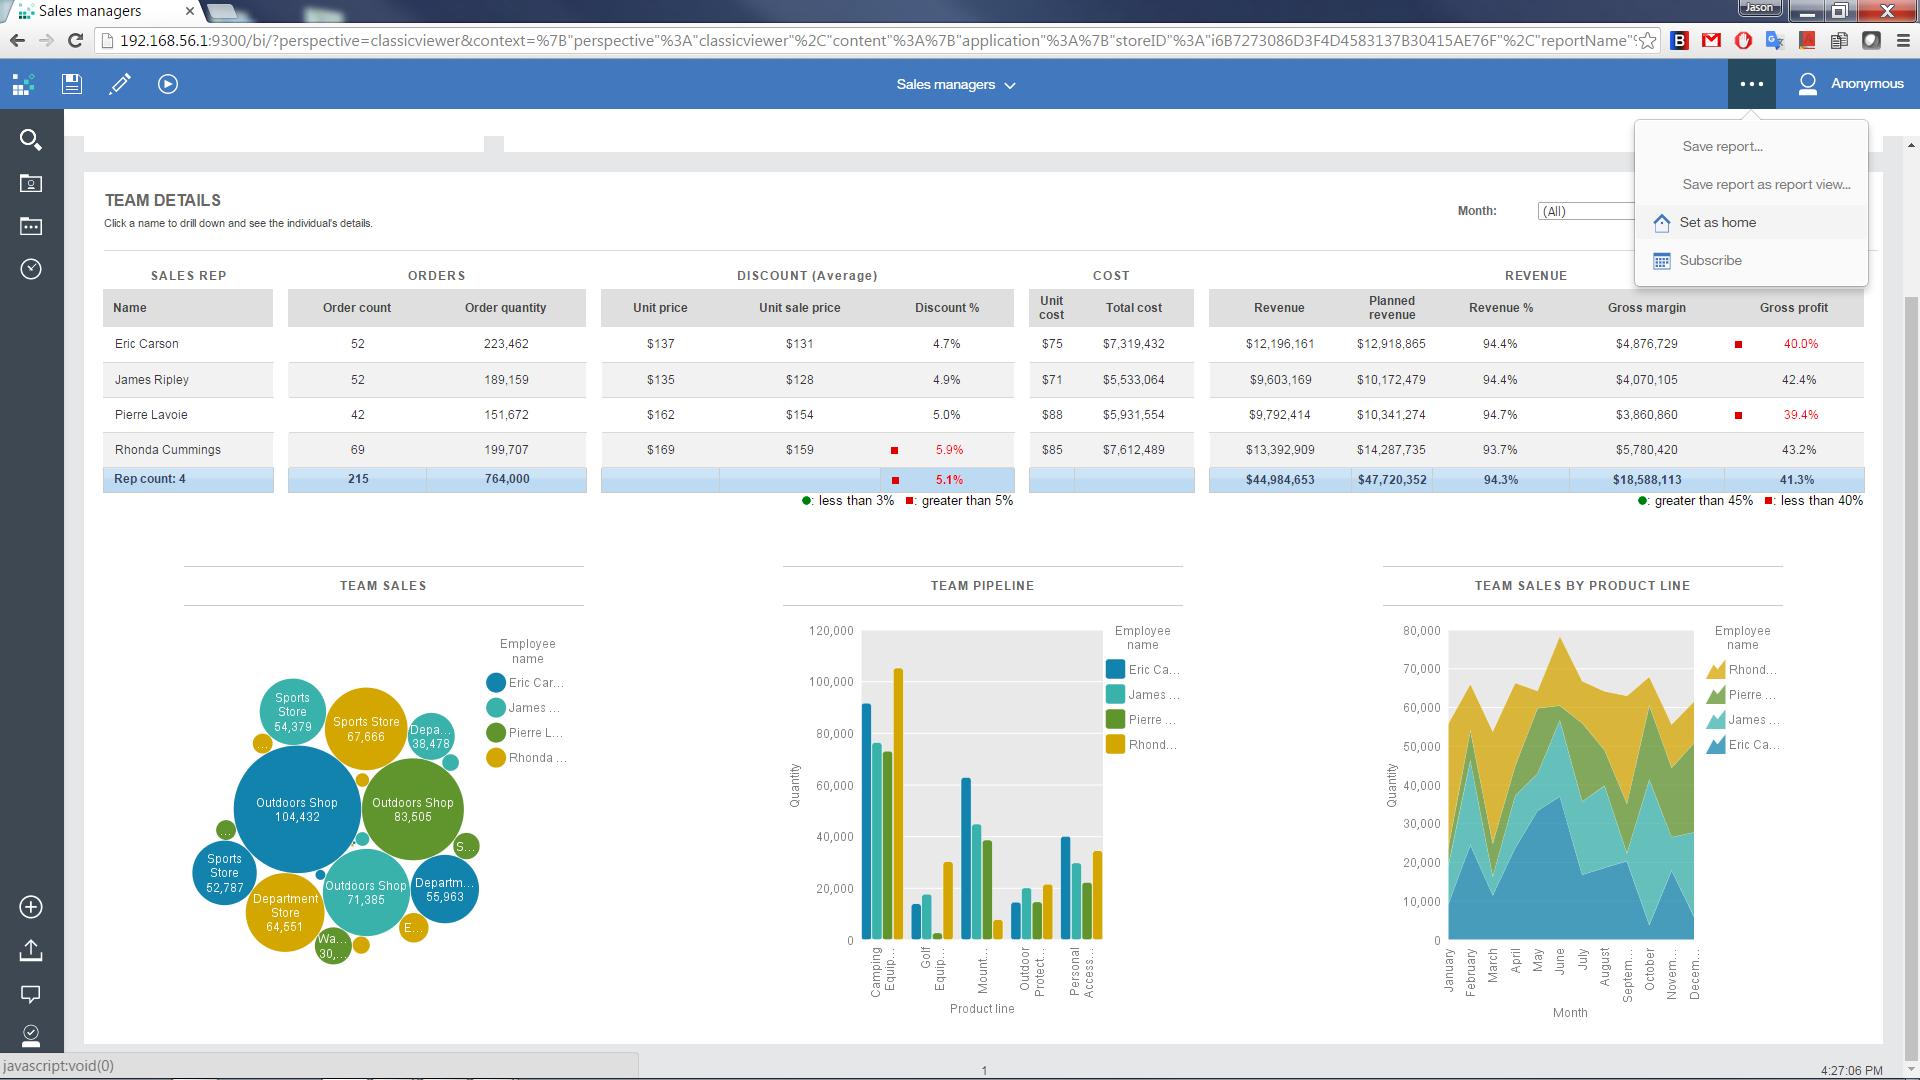 IBM Cognos Analytics Software - Reports